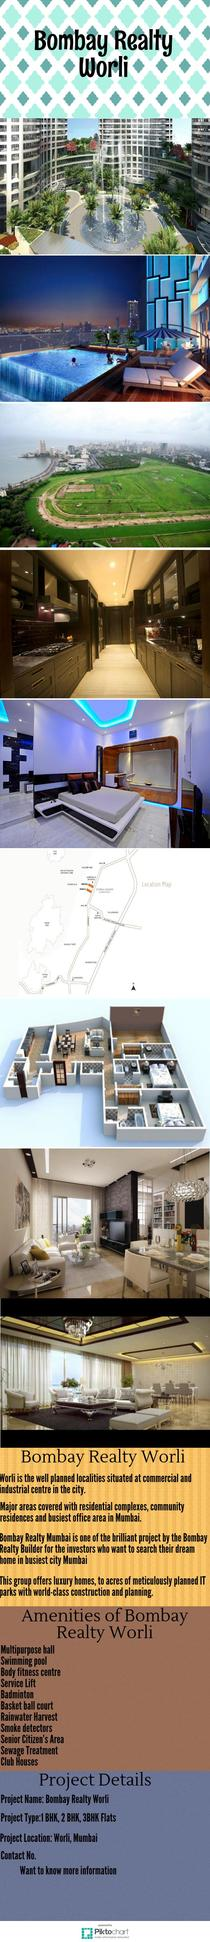 Bombay Realty Worli | Piktochart Infographic Editor